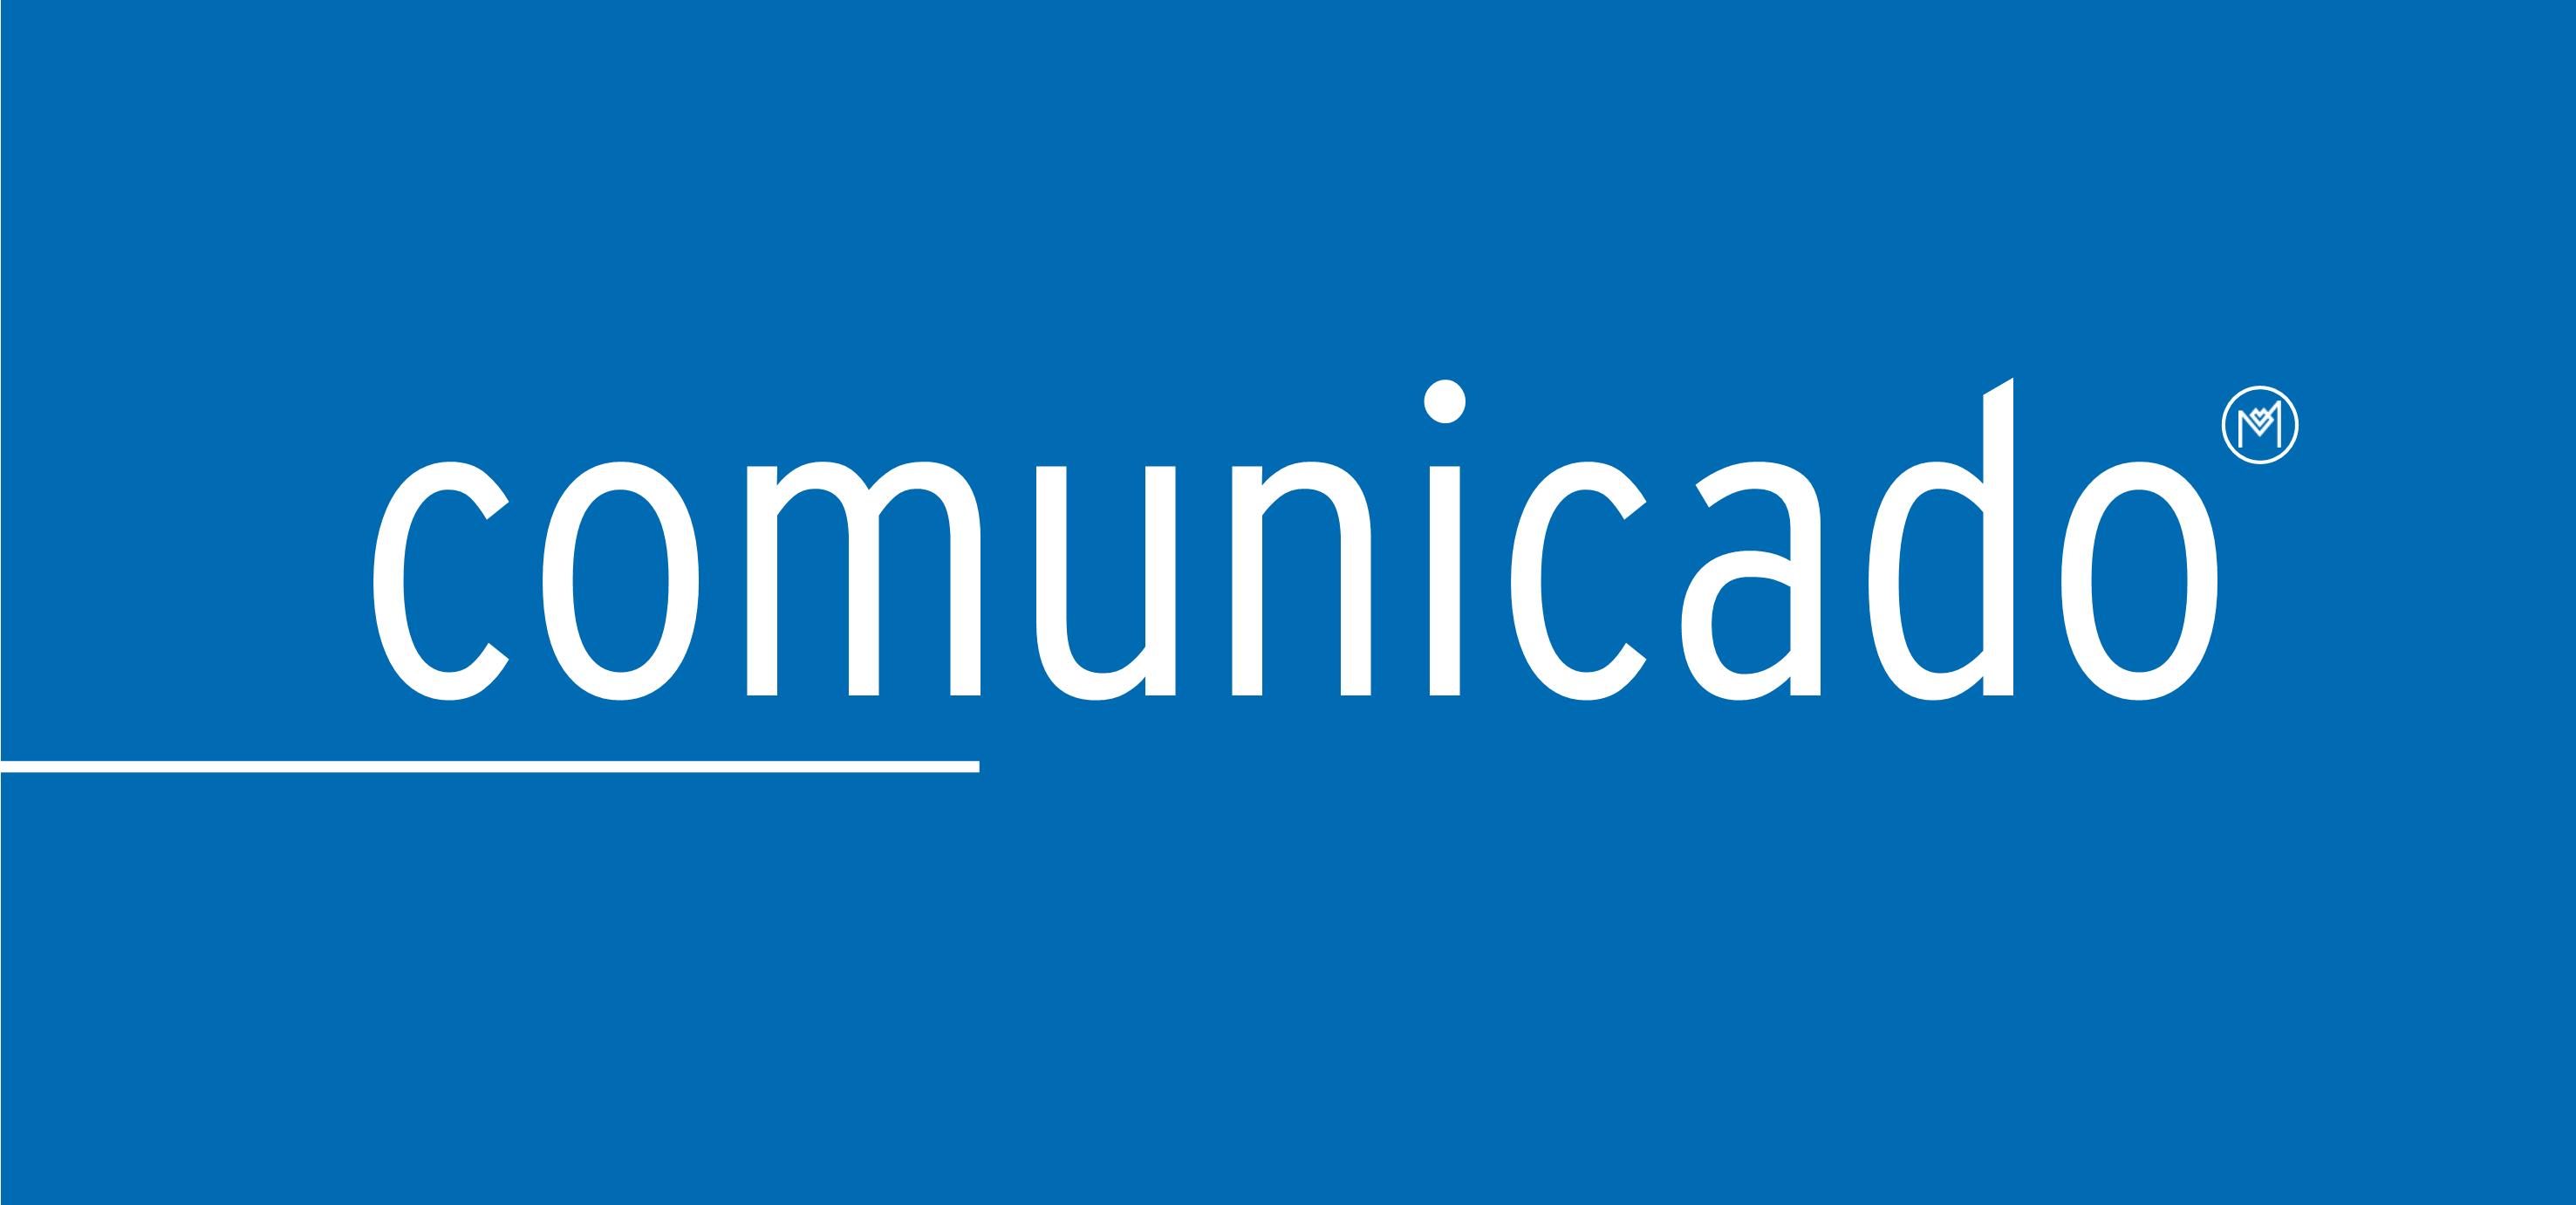 https://www.scmp.pt/assets/misc/img/noticias/2018/Comunicado%20MP.png